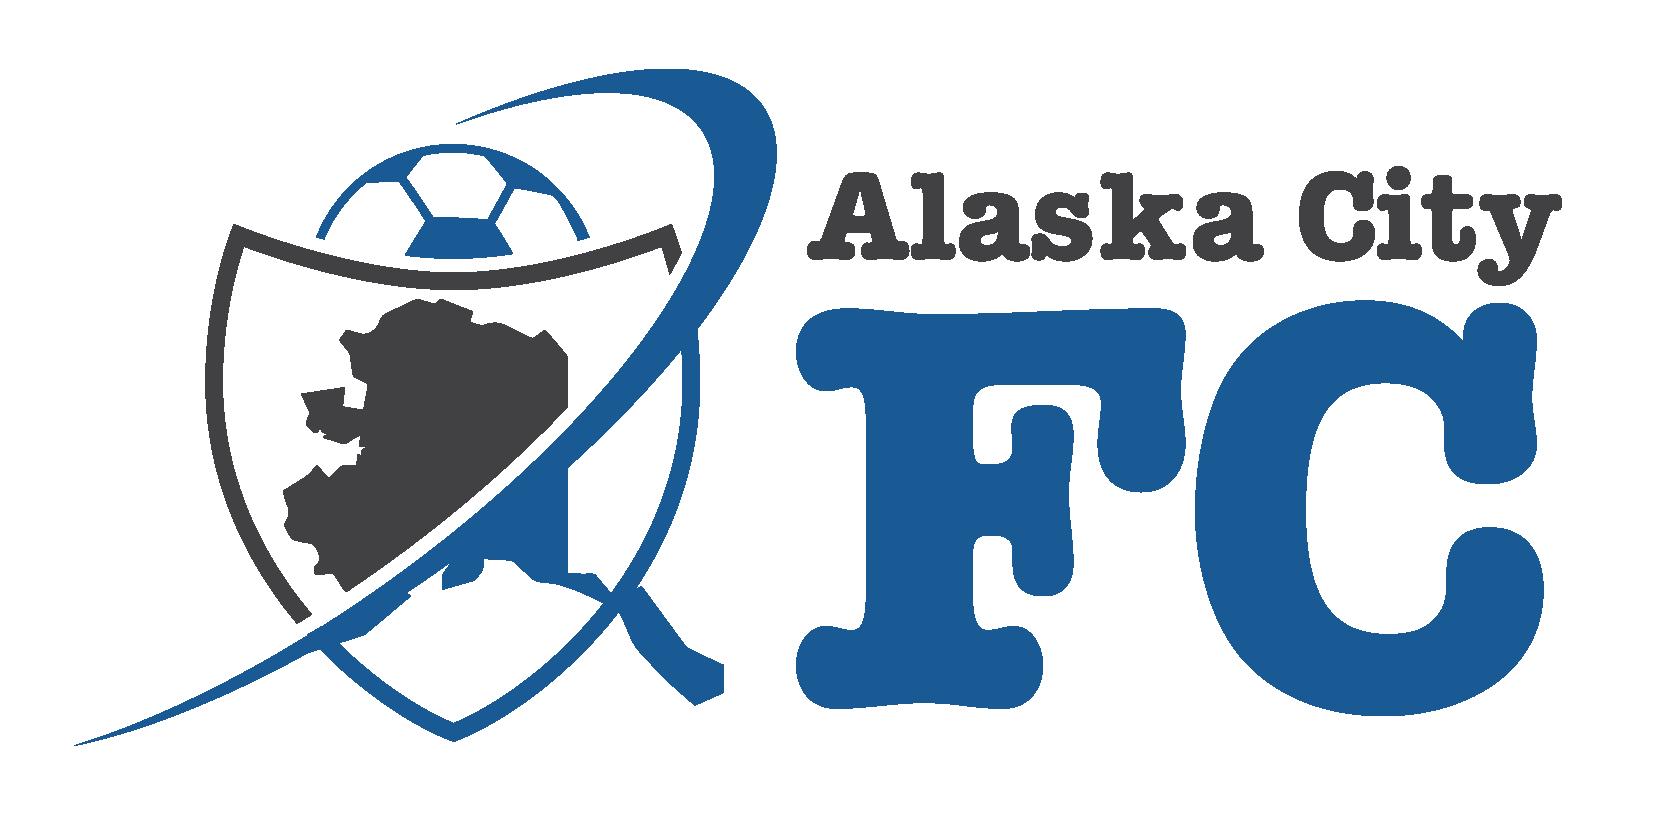 Alaska City FC